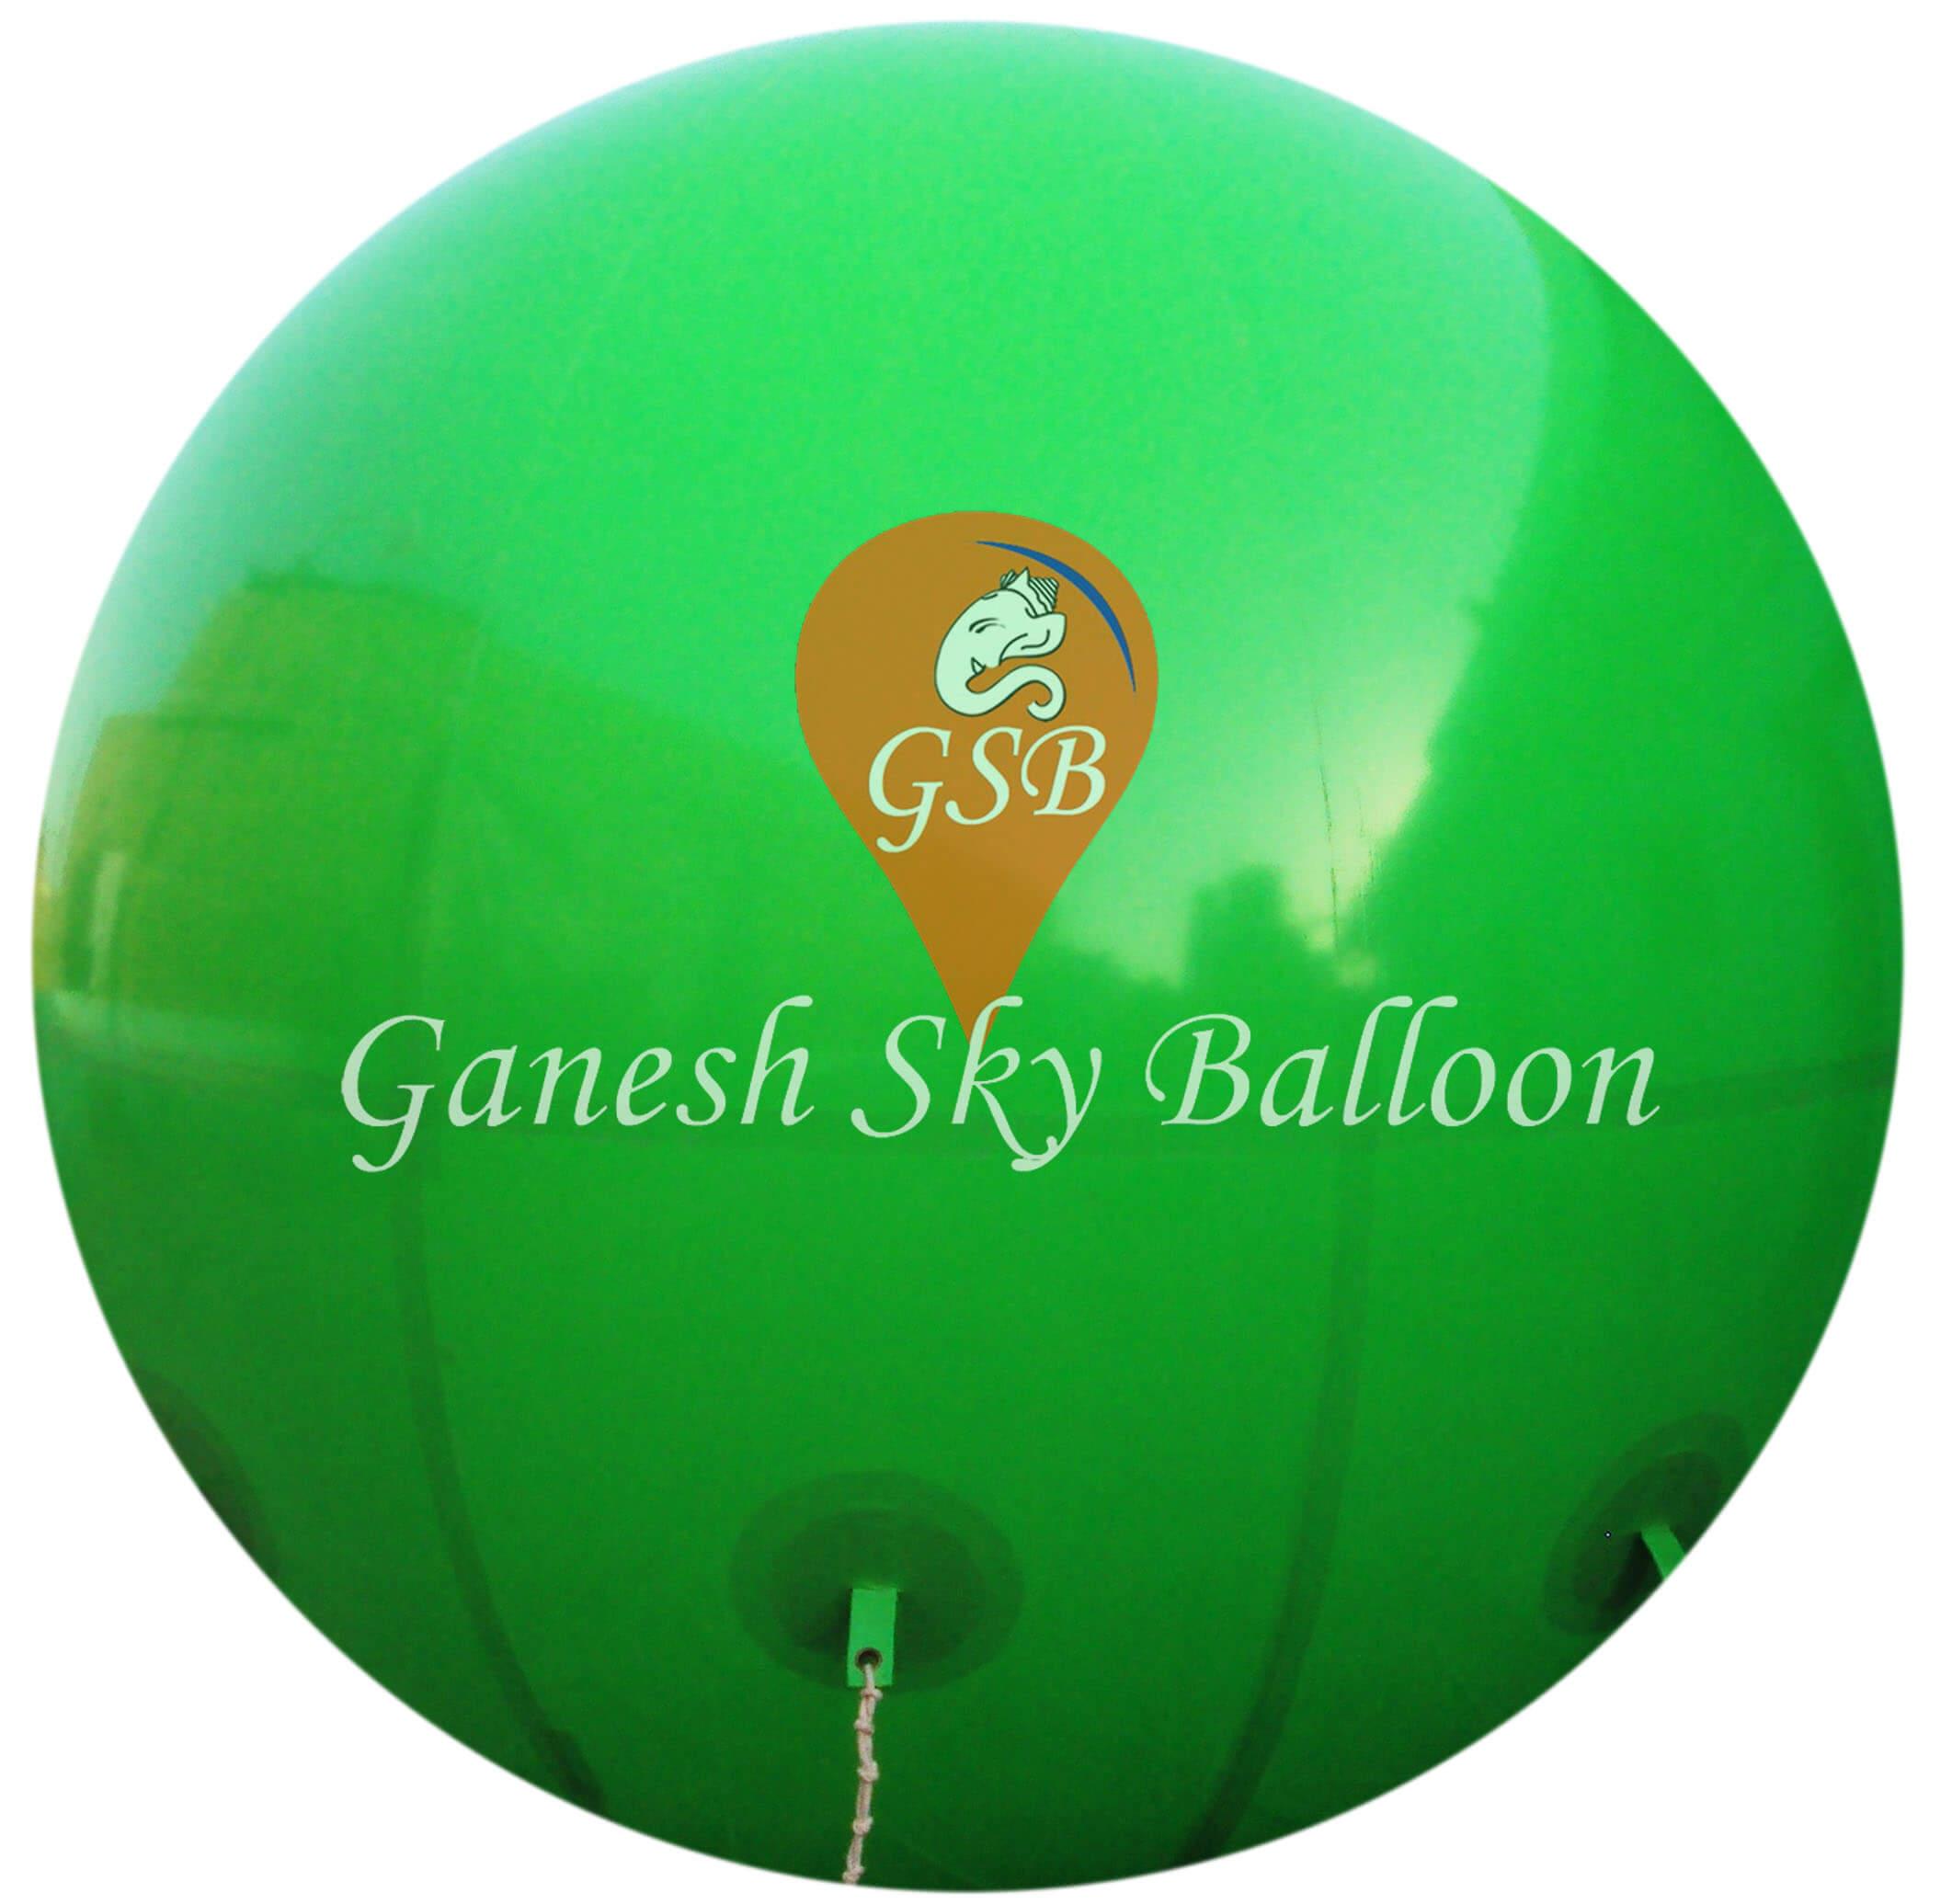 BJP Promotional Balloon